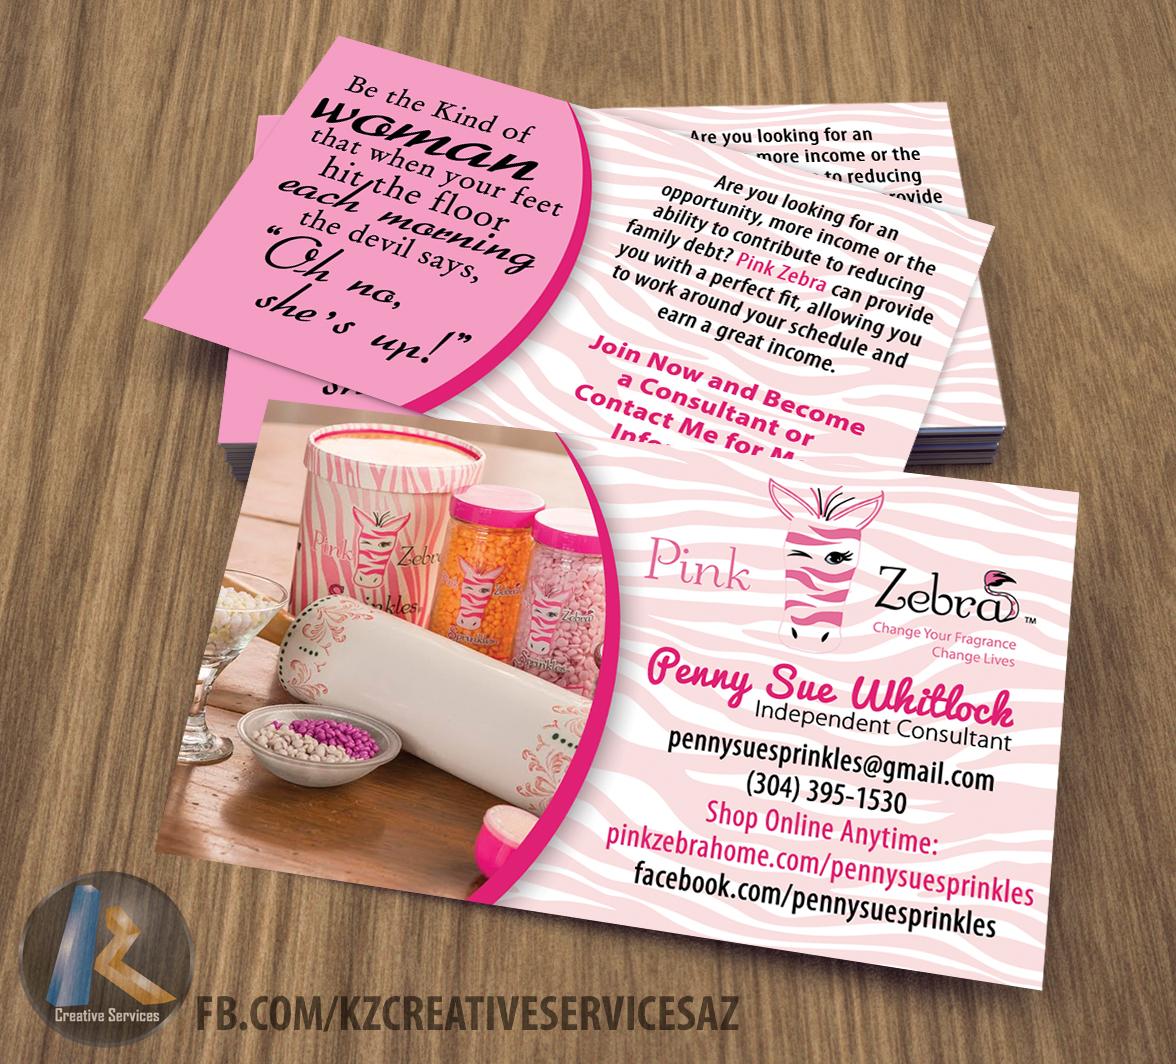 Pink zebra business cards style 5 kz creative services online pink zebra business cards style 5 colourmoves